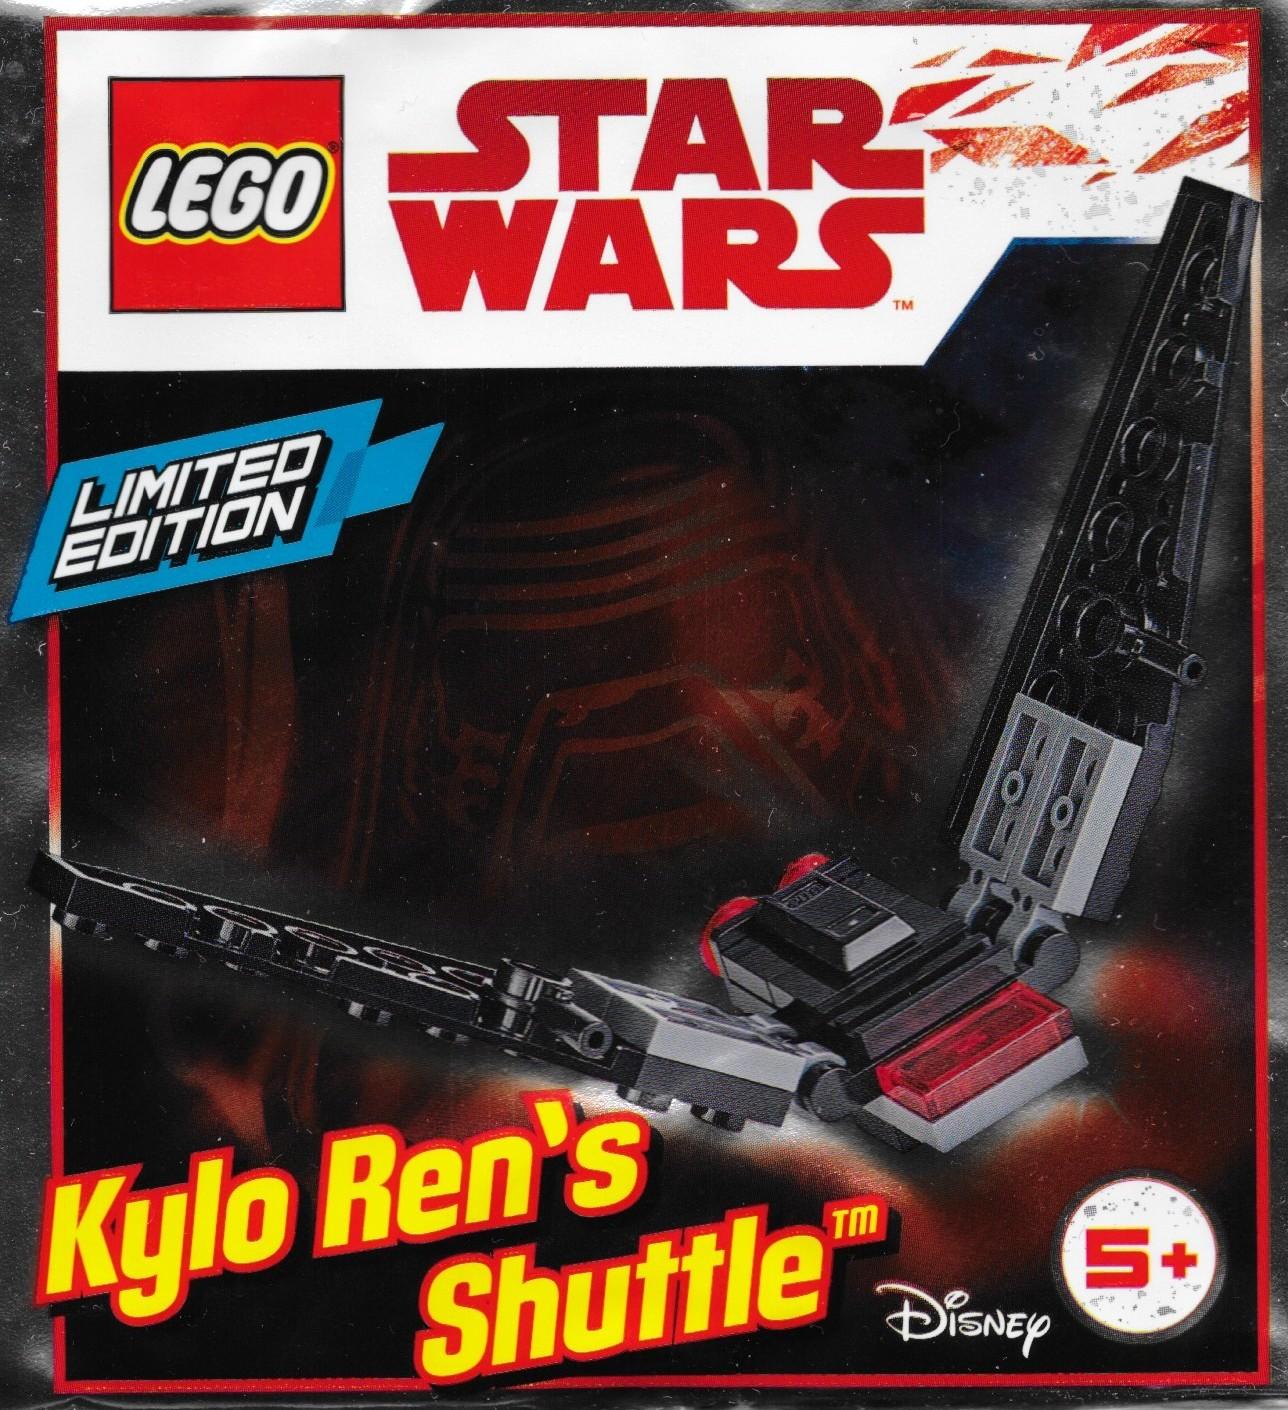 911831 Kylo Ren's Shuttle